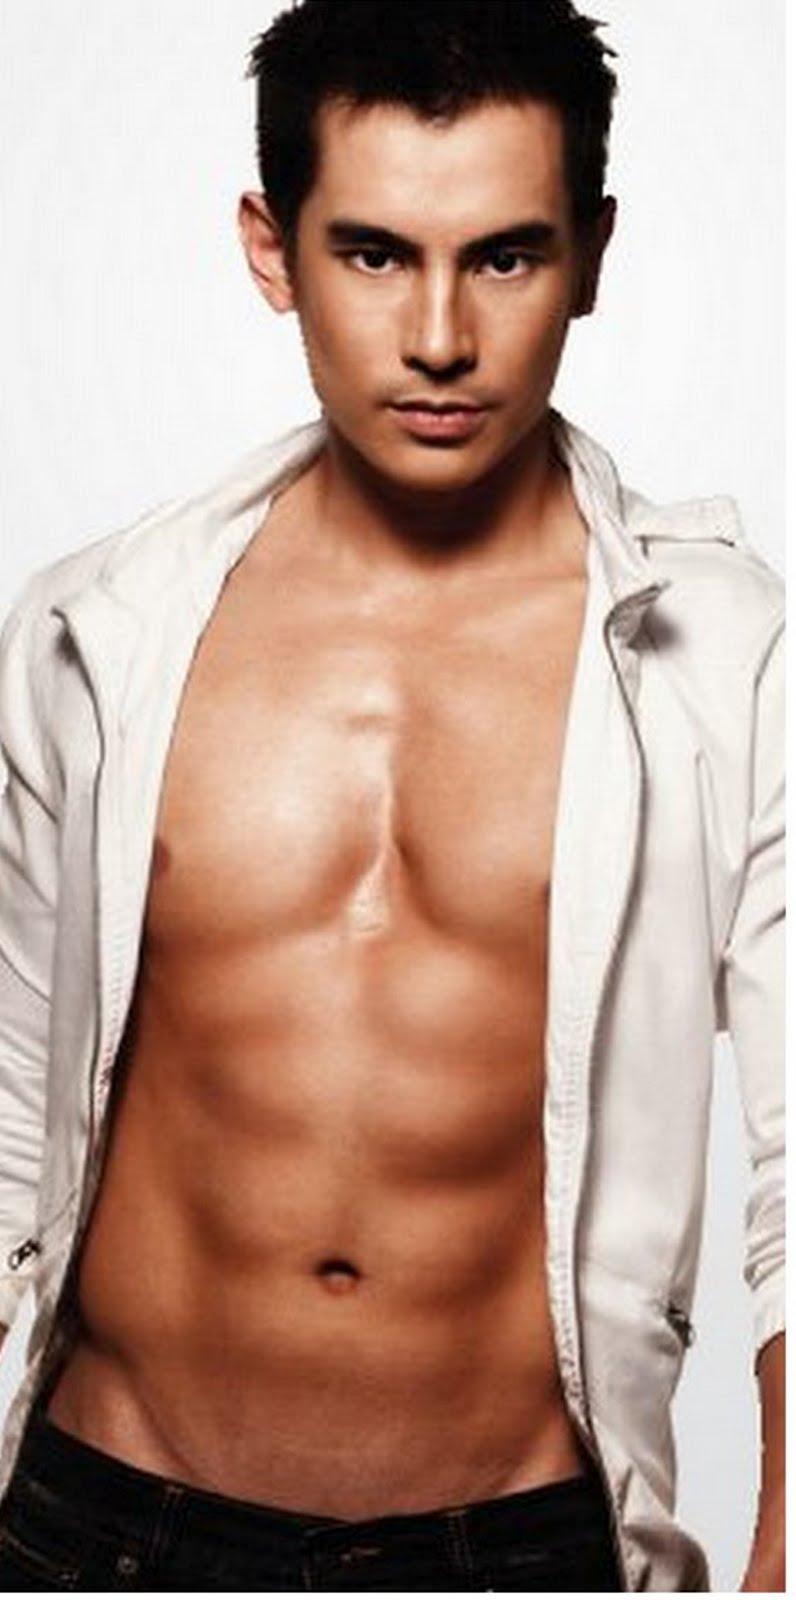 Mister Universe Model 2011